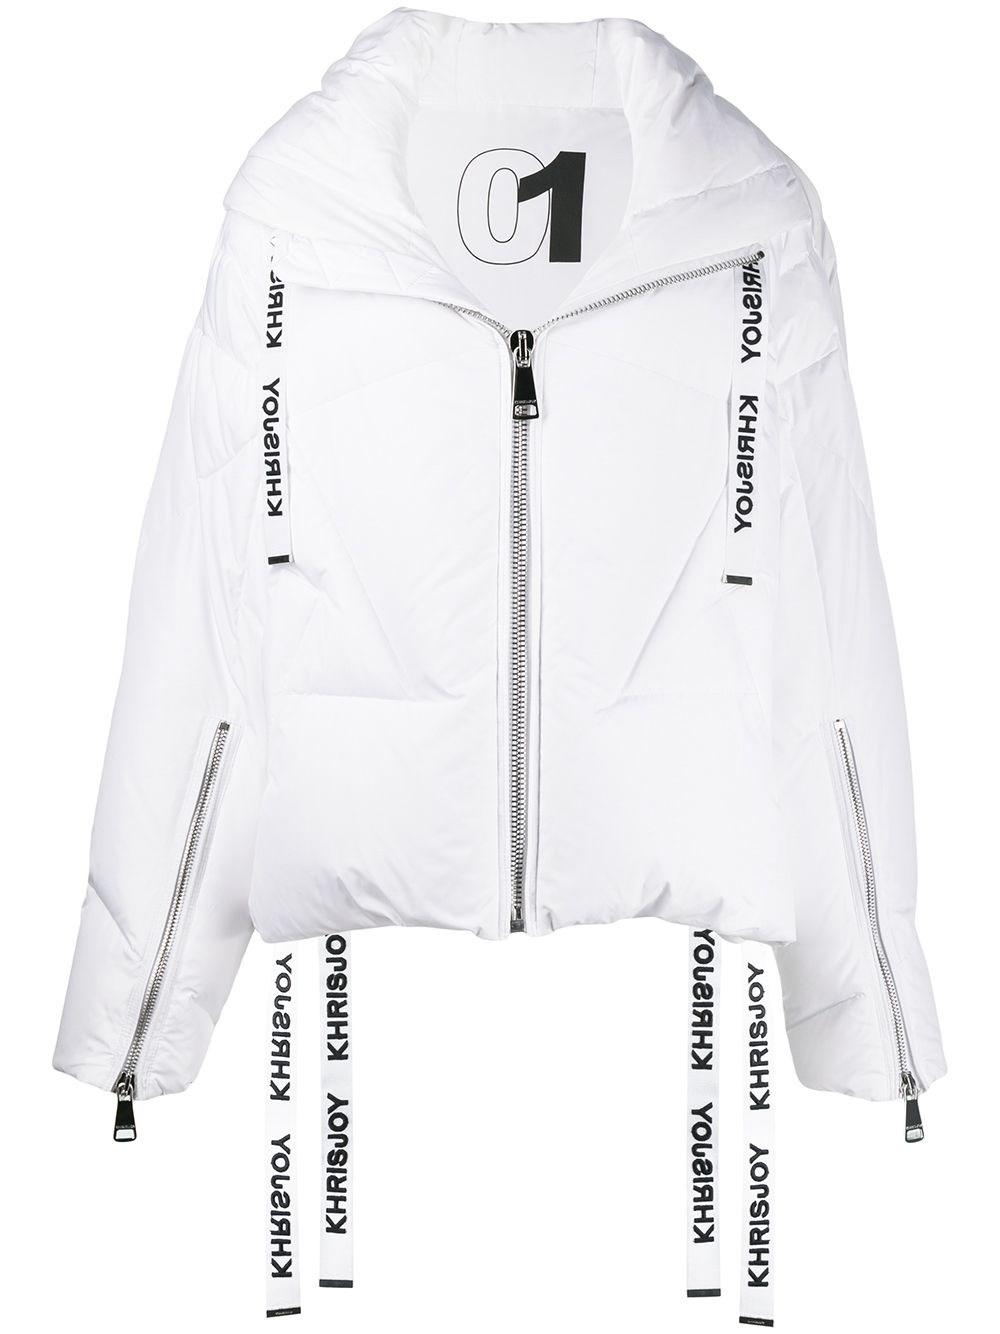 KHRISJOY White Puffer Jacket